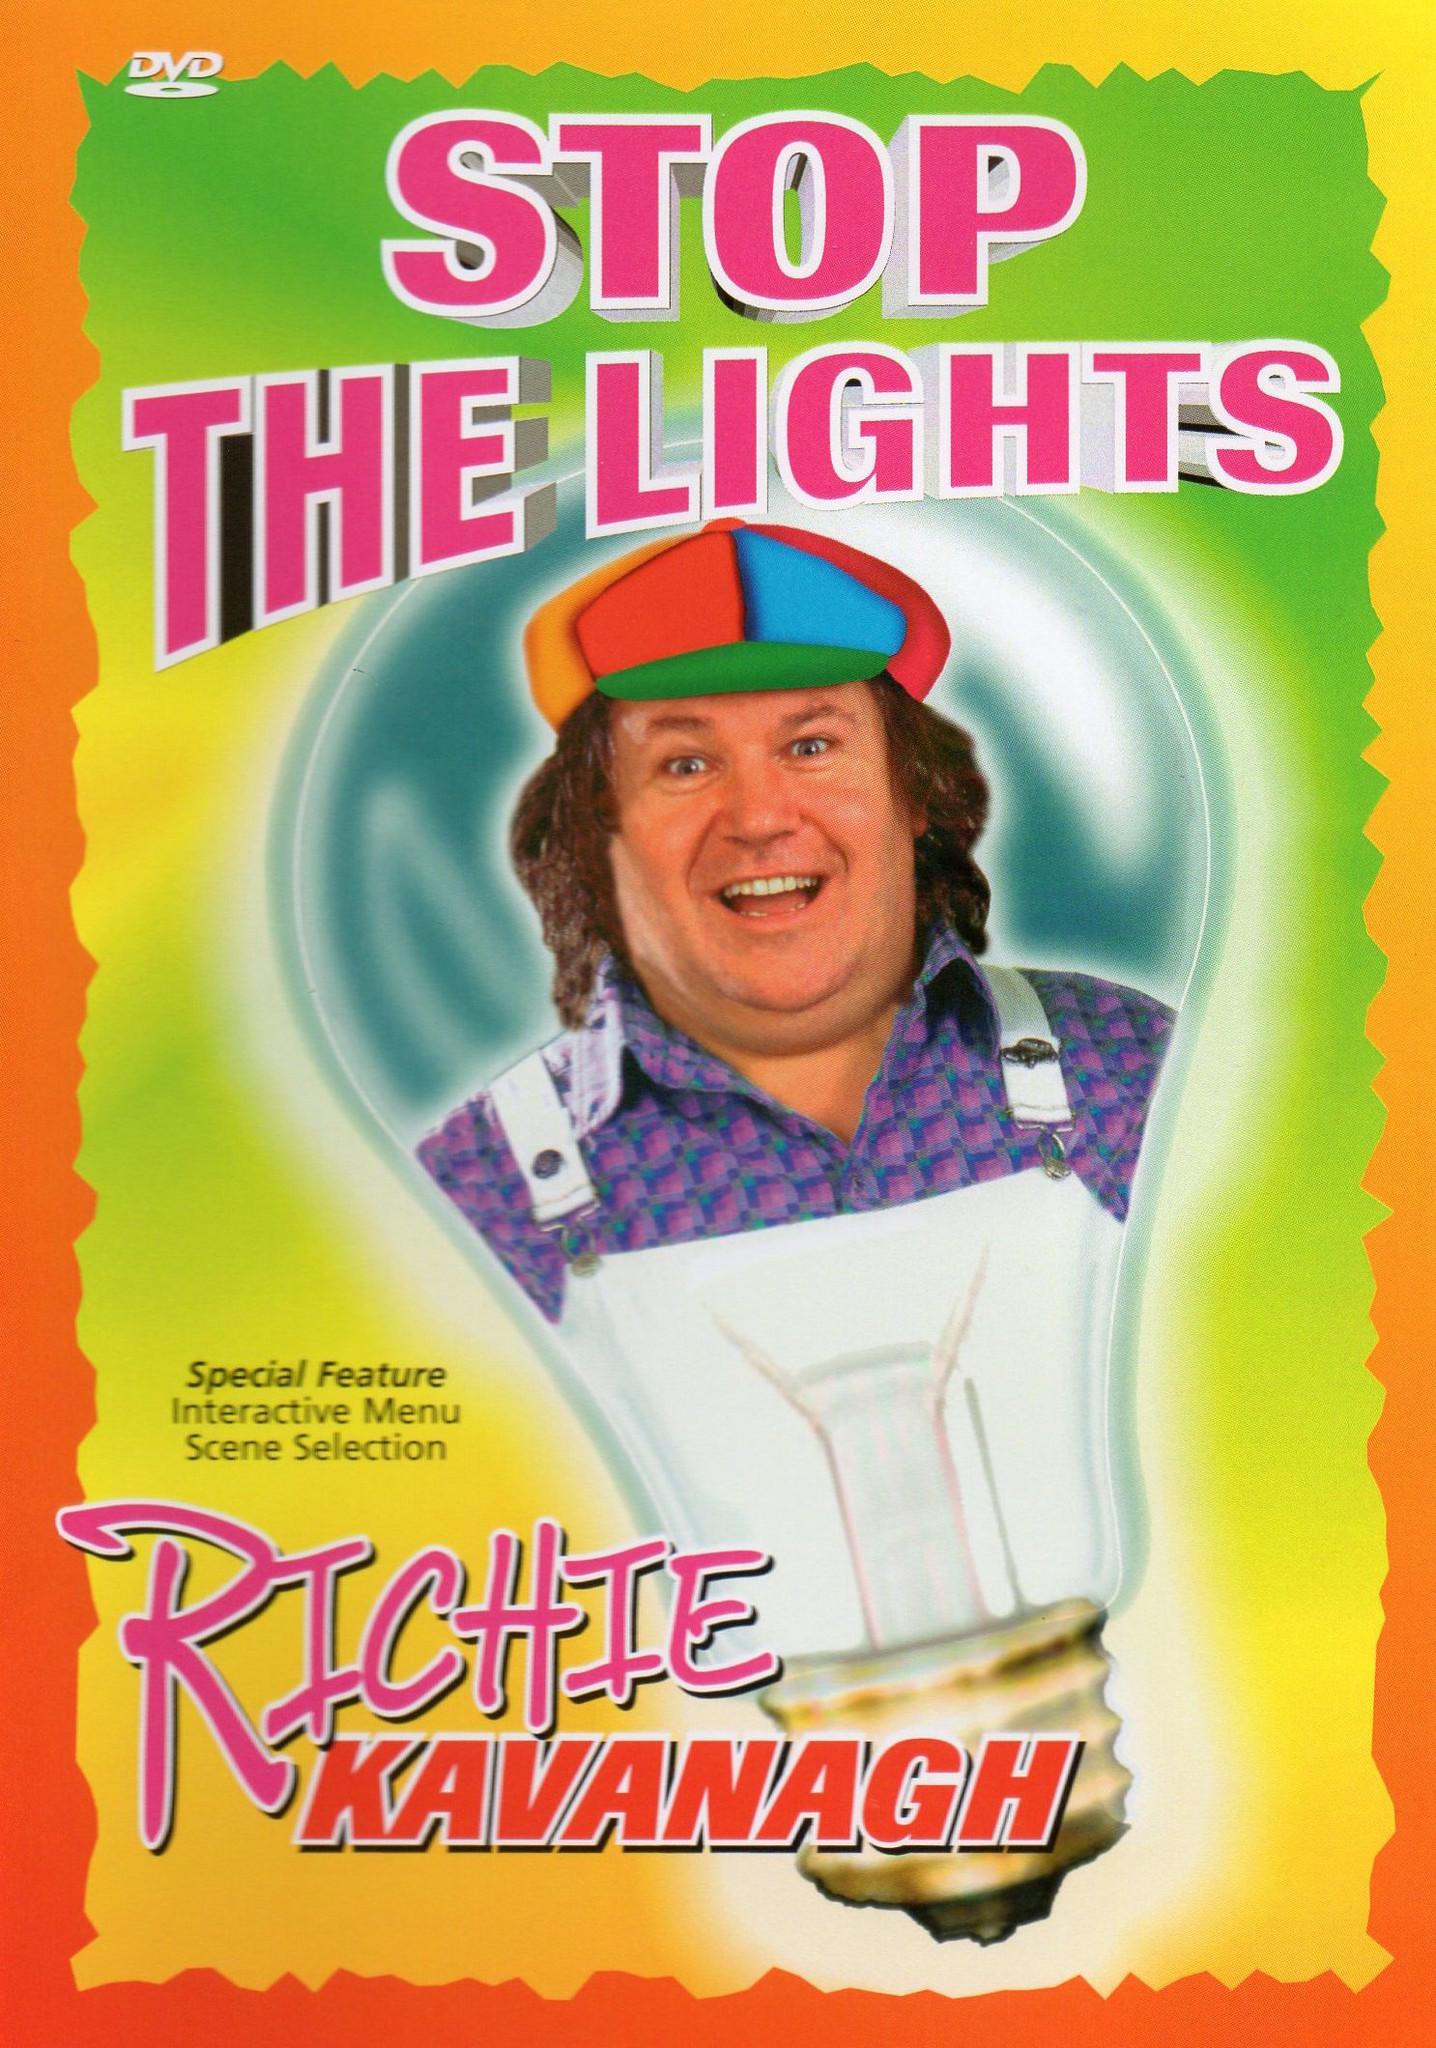 Richie Kavanagh Stop The Lights DVD - CDWorld ie